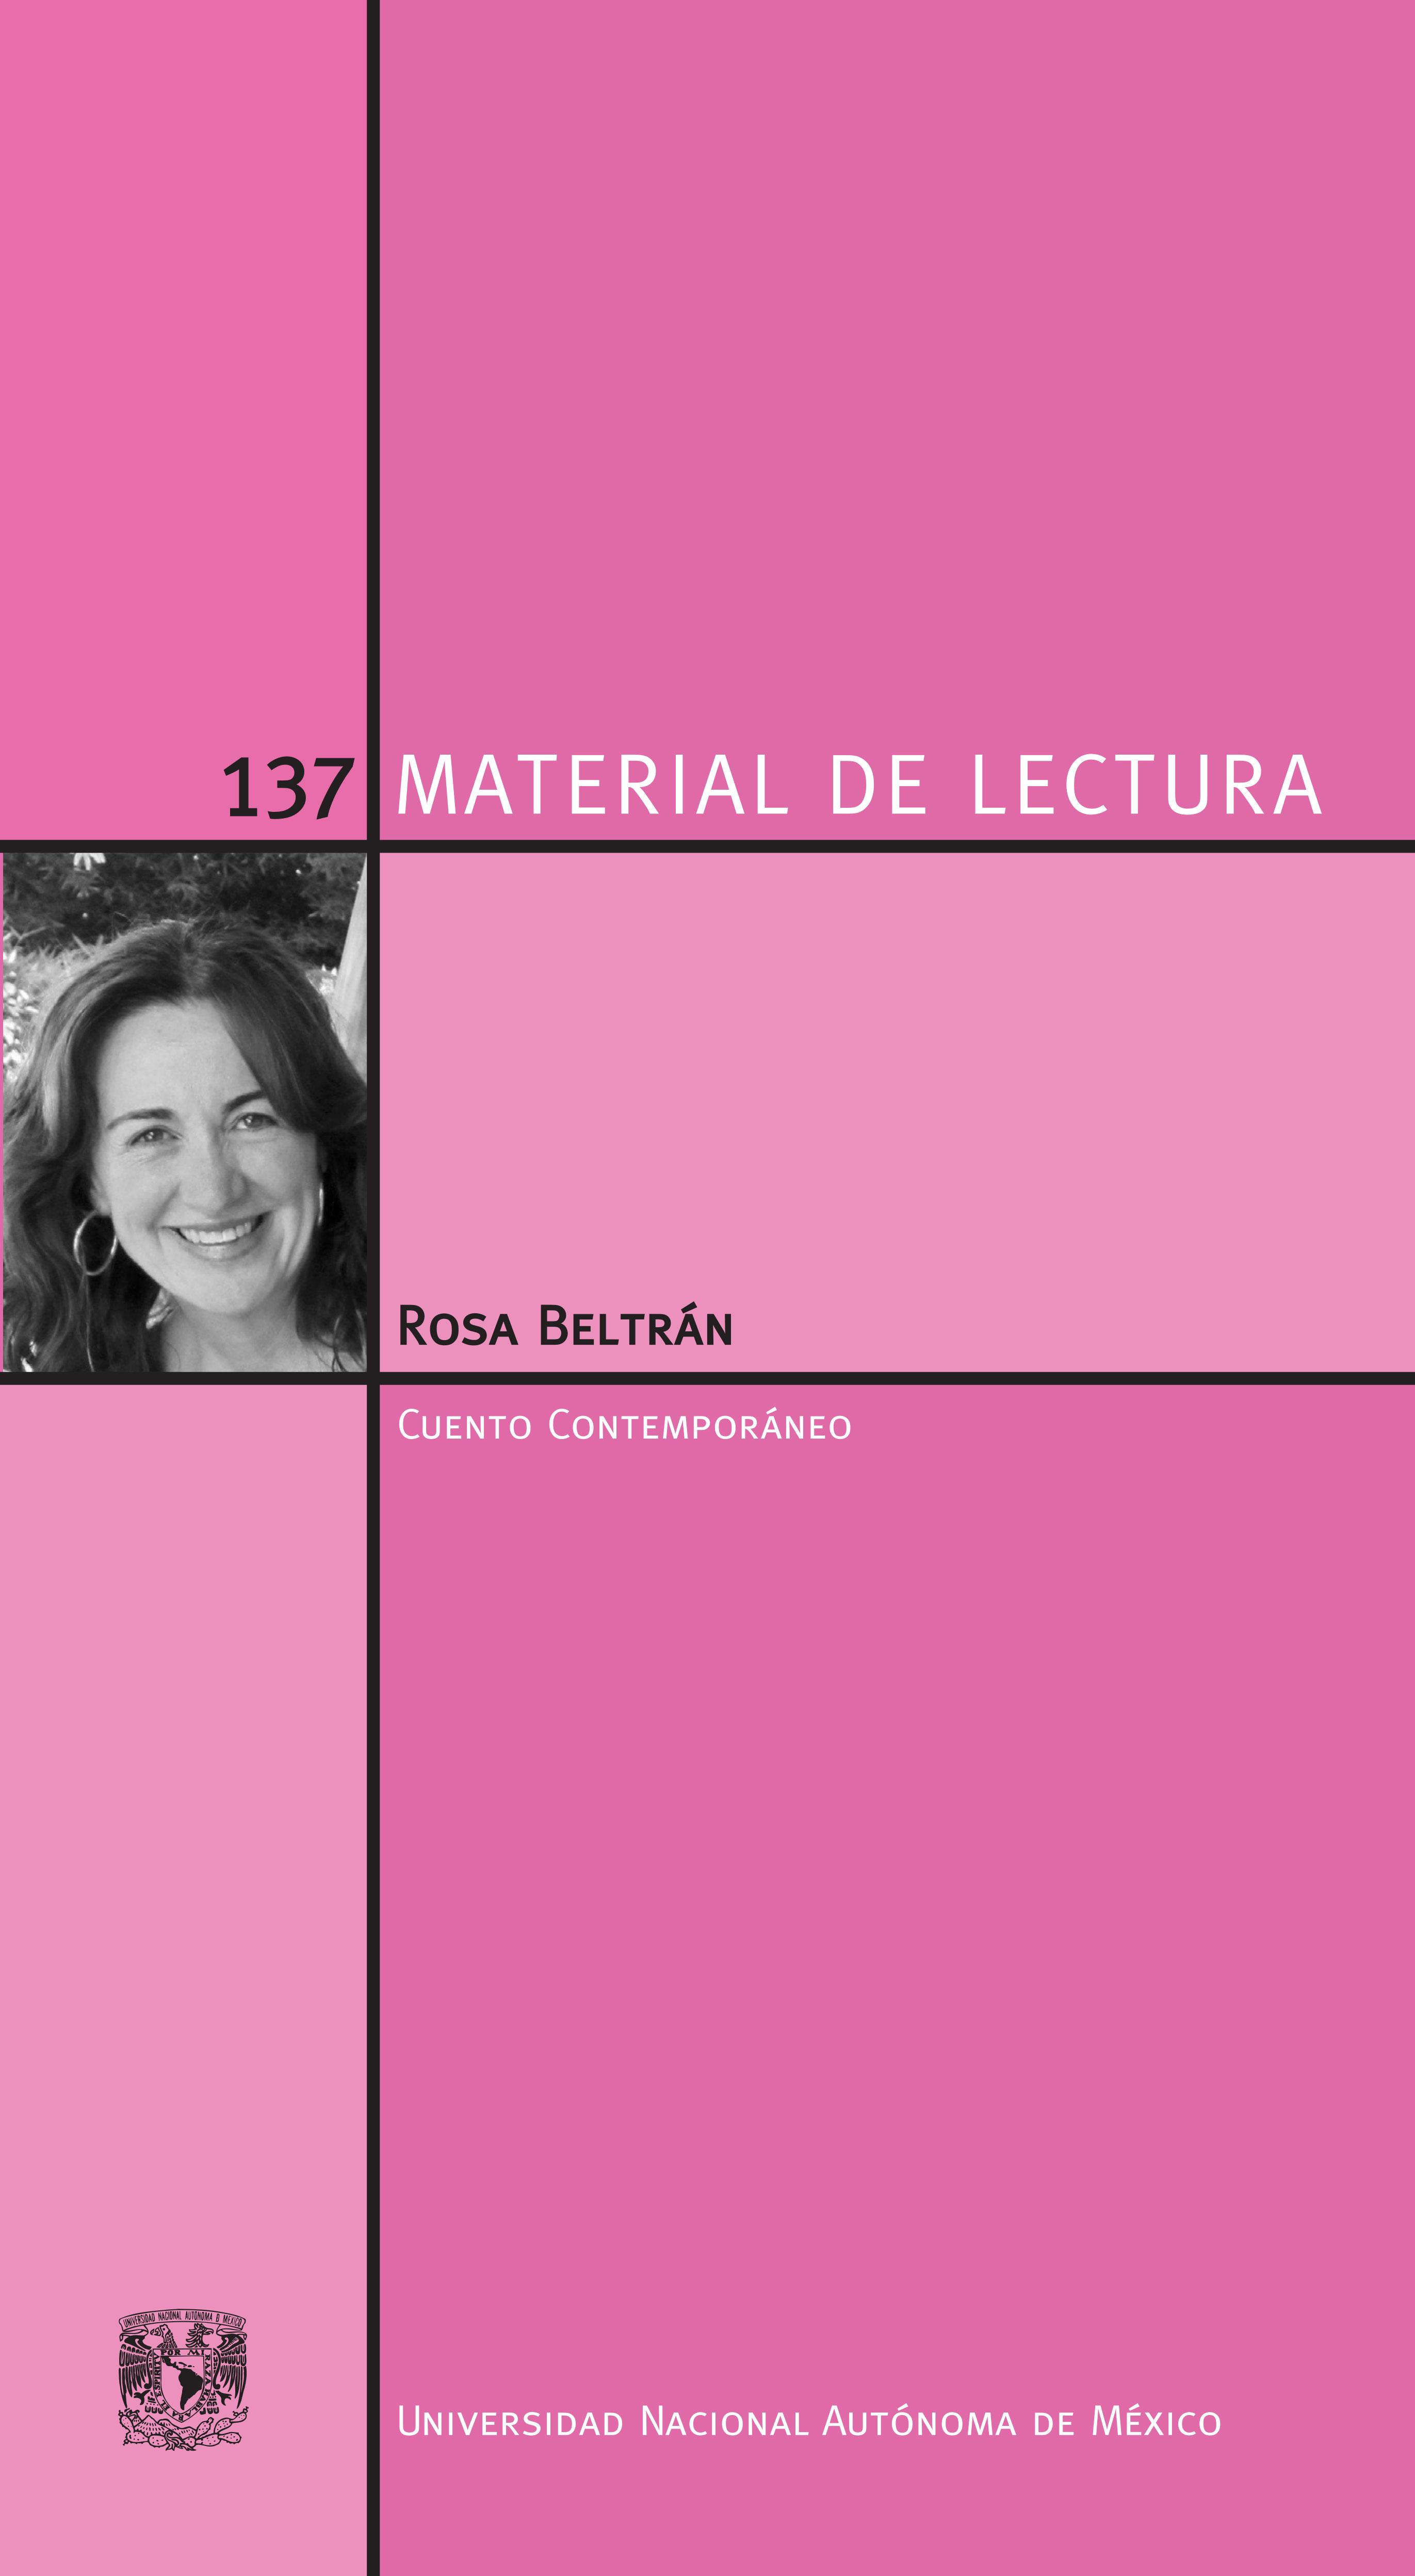 Rosa Beltrán. Material de Lectura